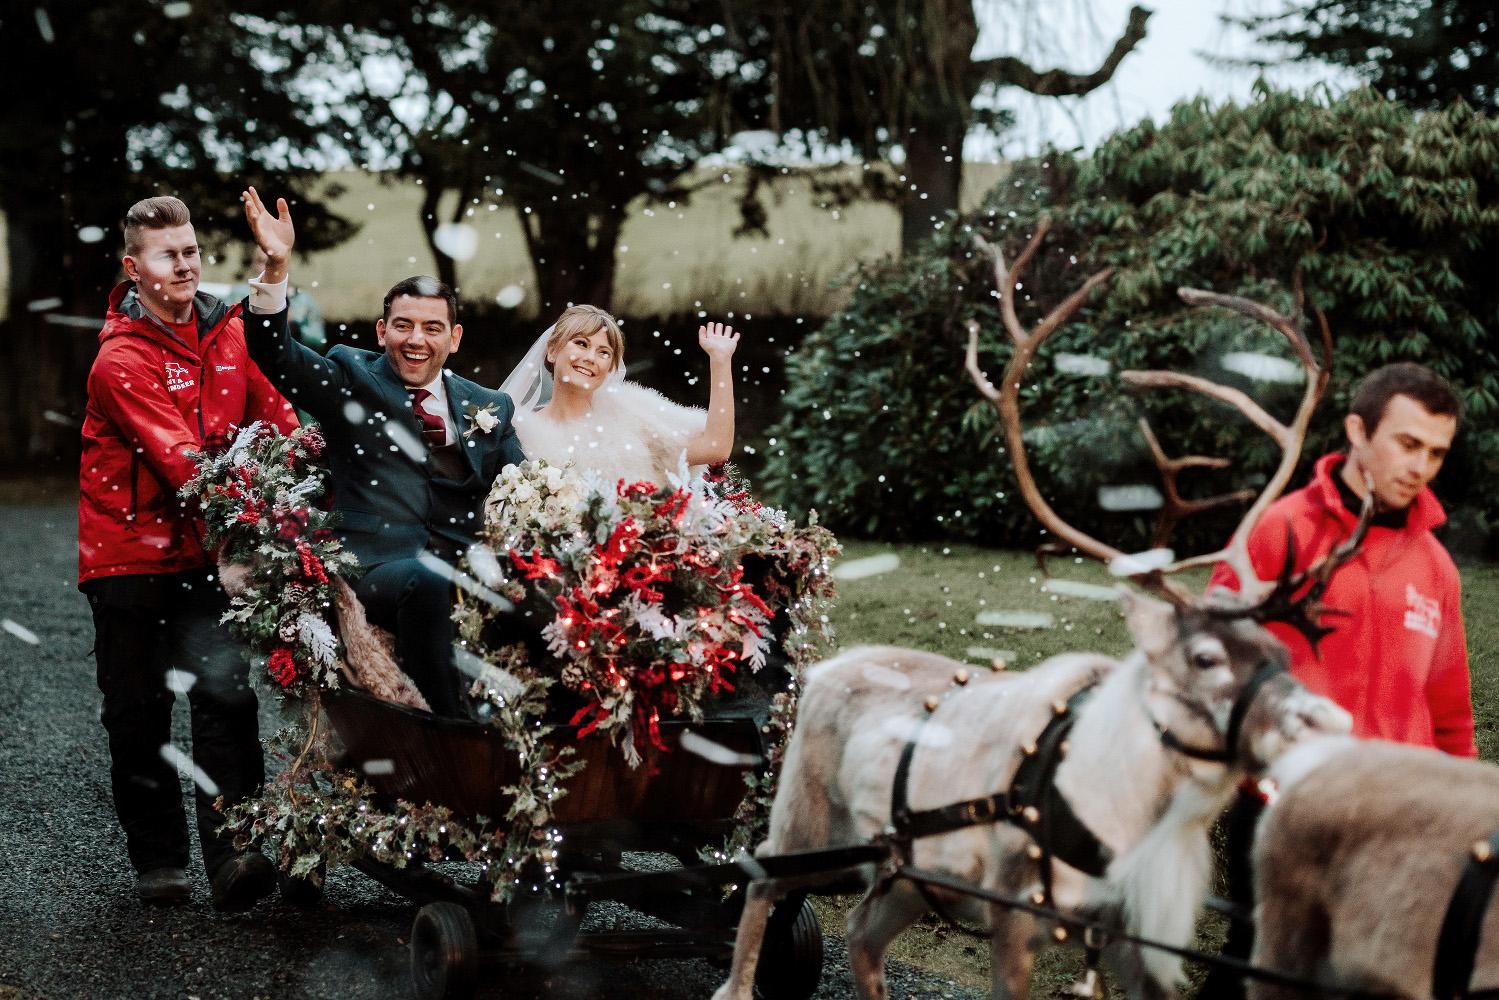 bride and groom sitting in a sleigh pulled by reindeer